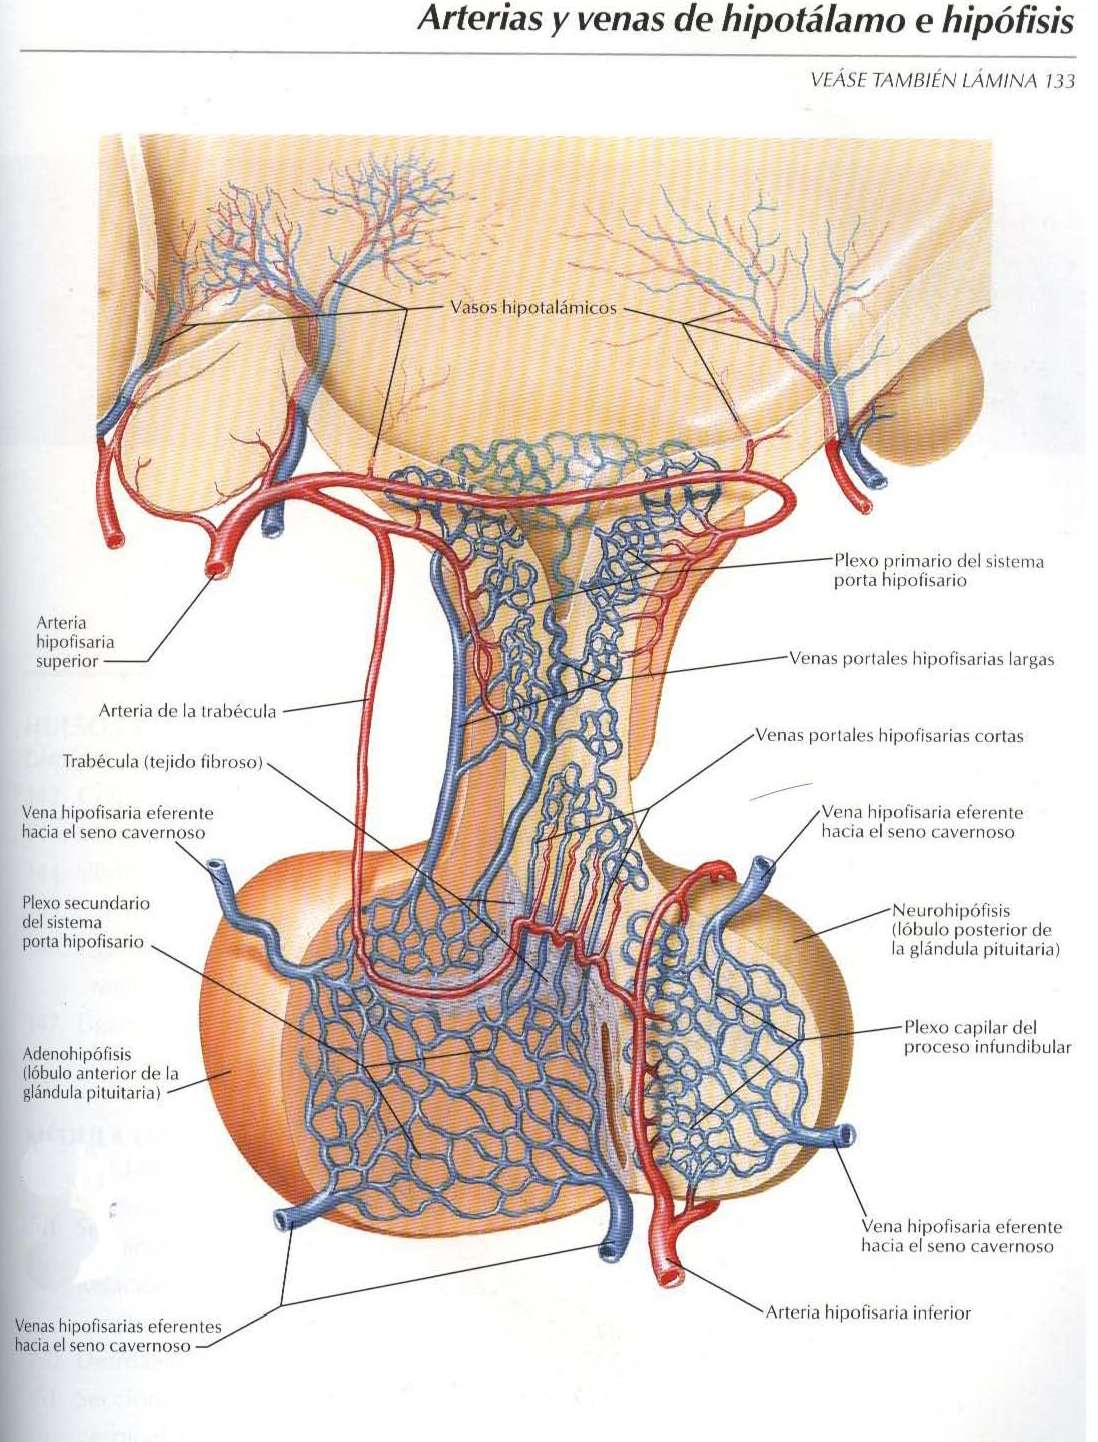 Atlas: Arteria y venas de hipotálamo e hipófisis